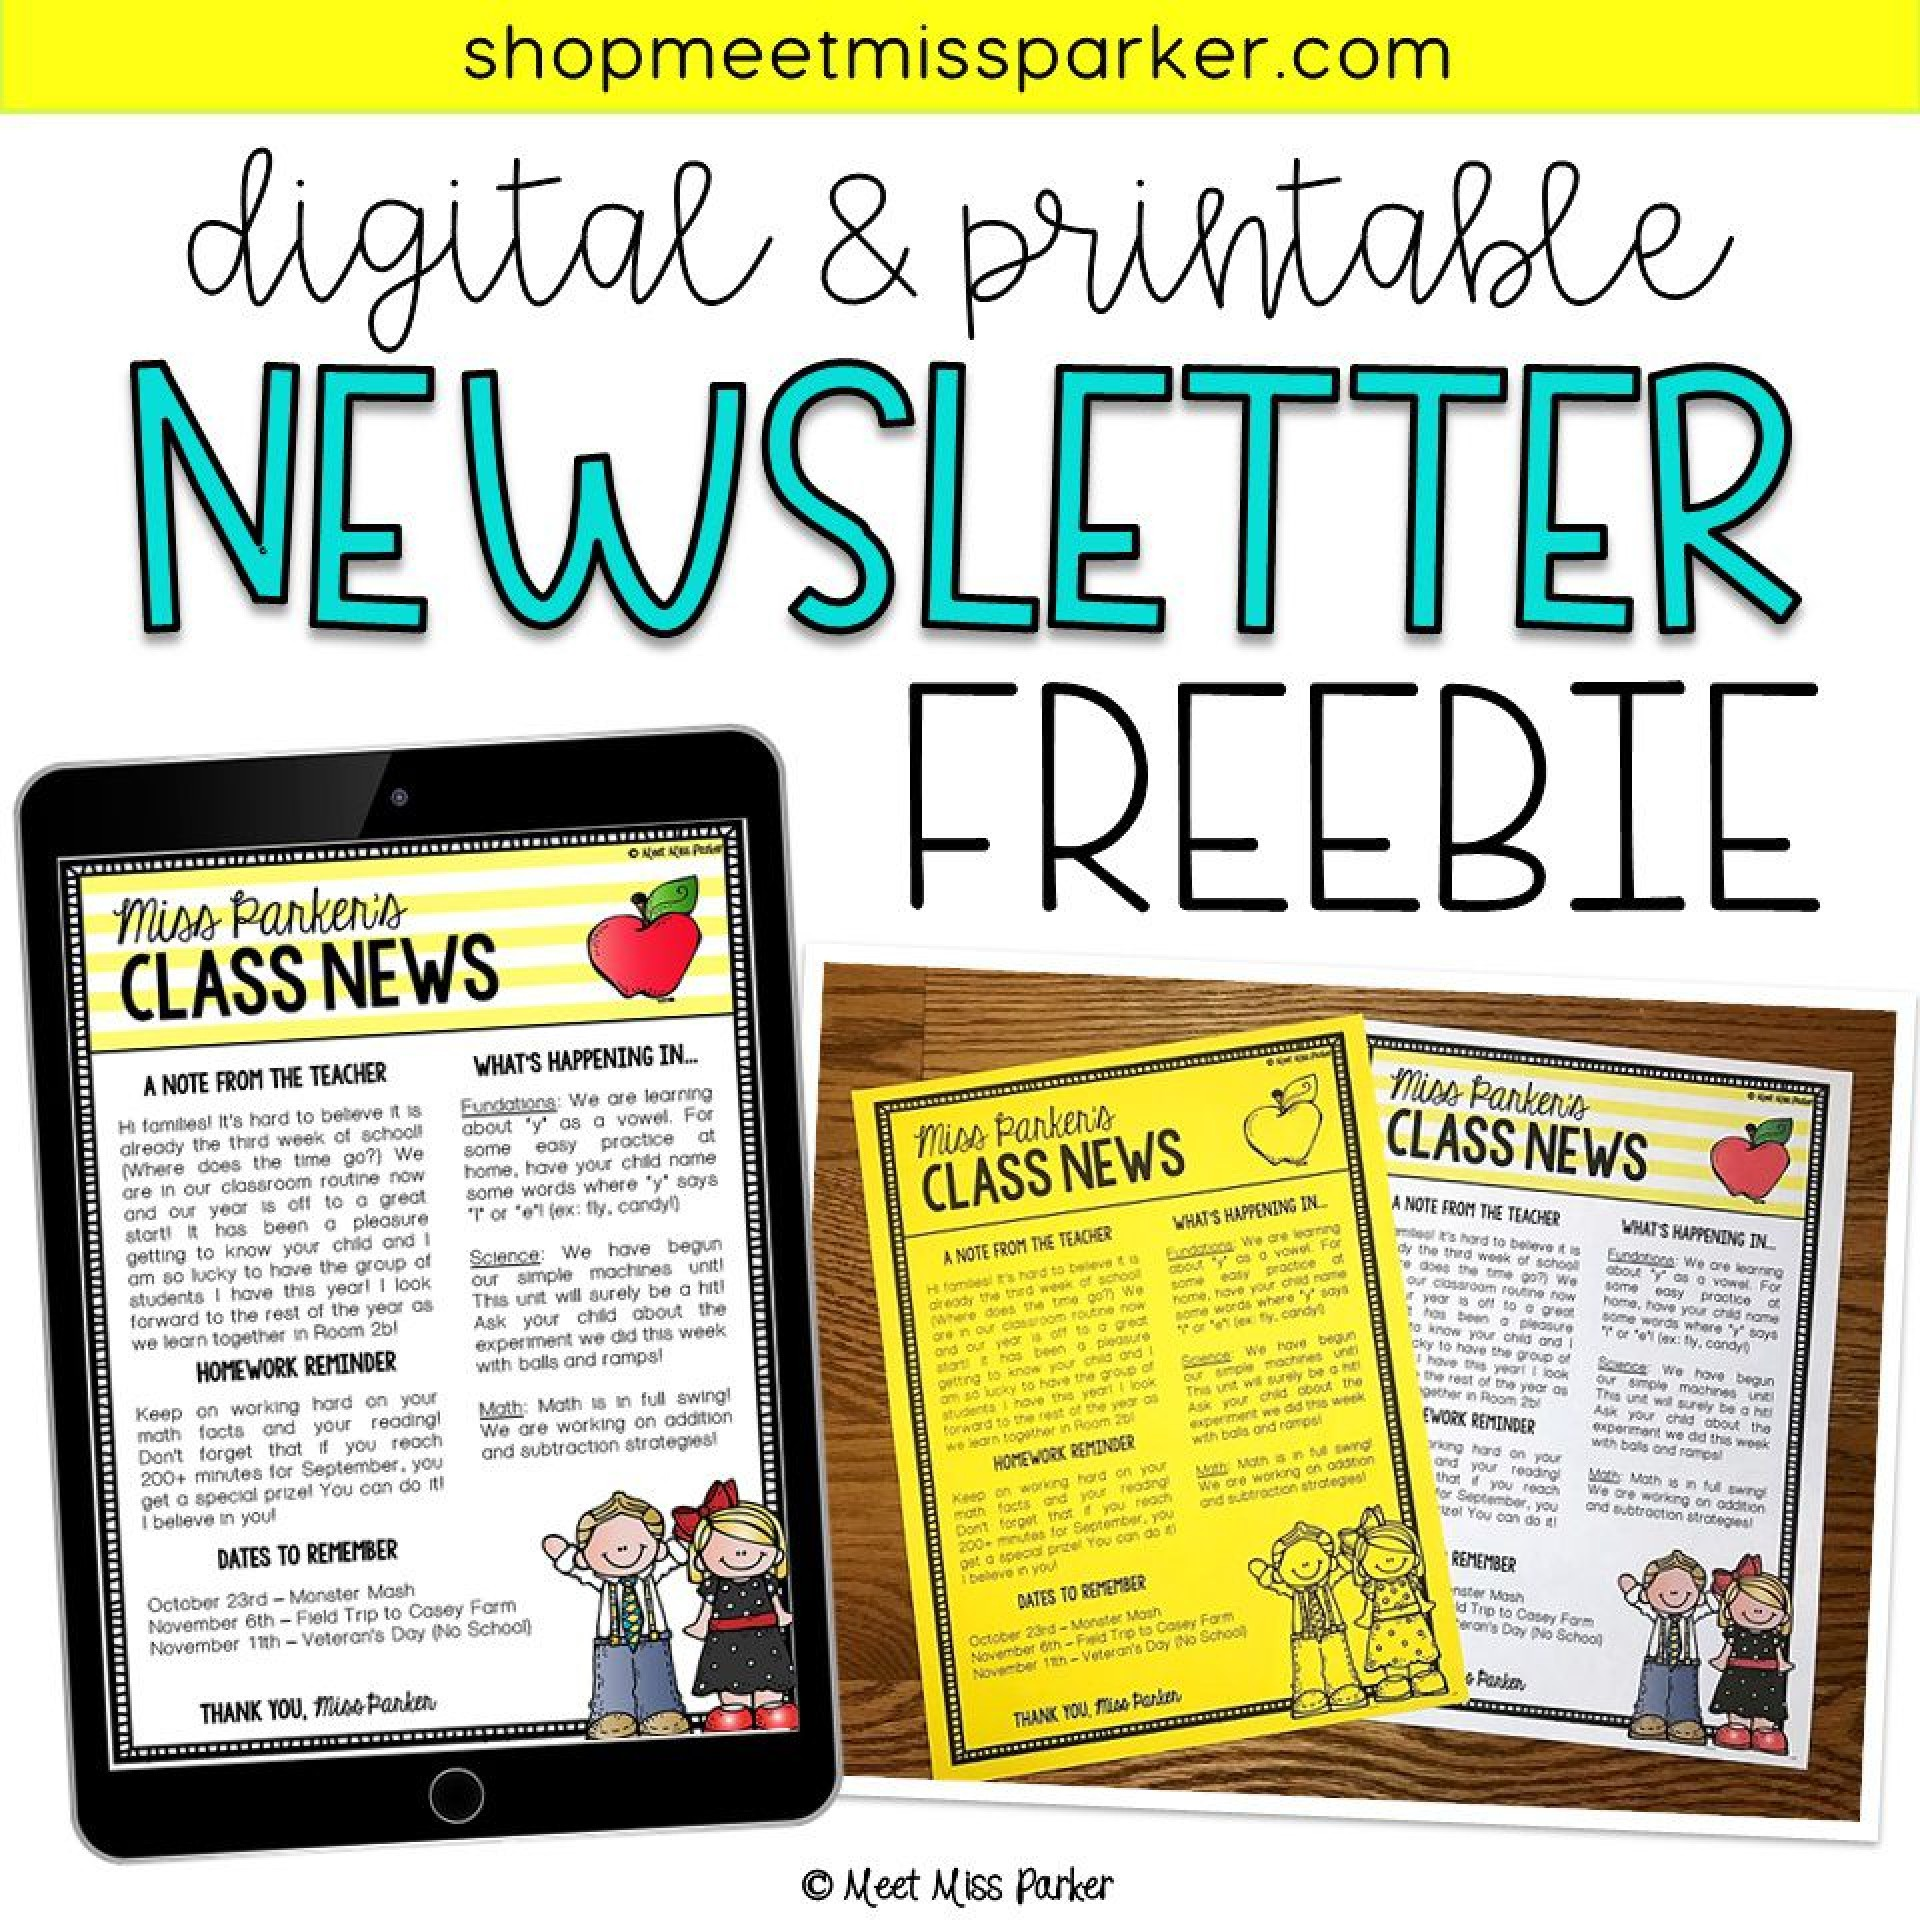 003 Impressive Newsletter Template For Teacher High Def  Teachers To Parent Printable Free School1920